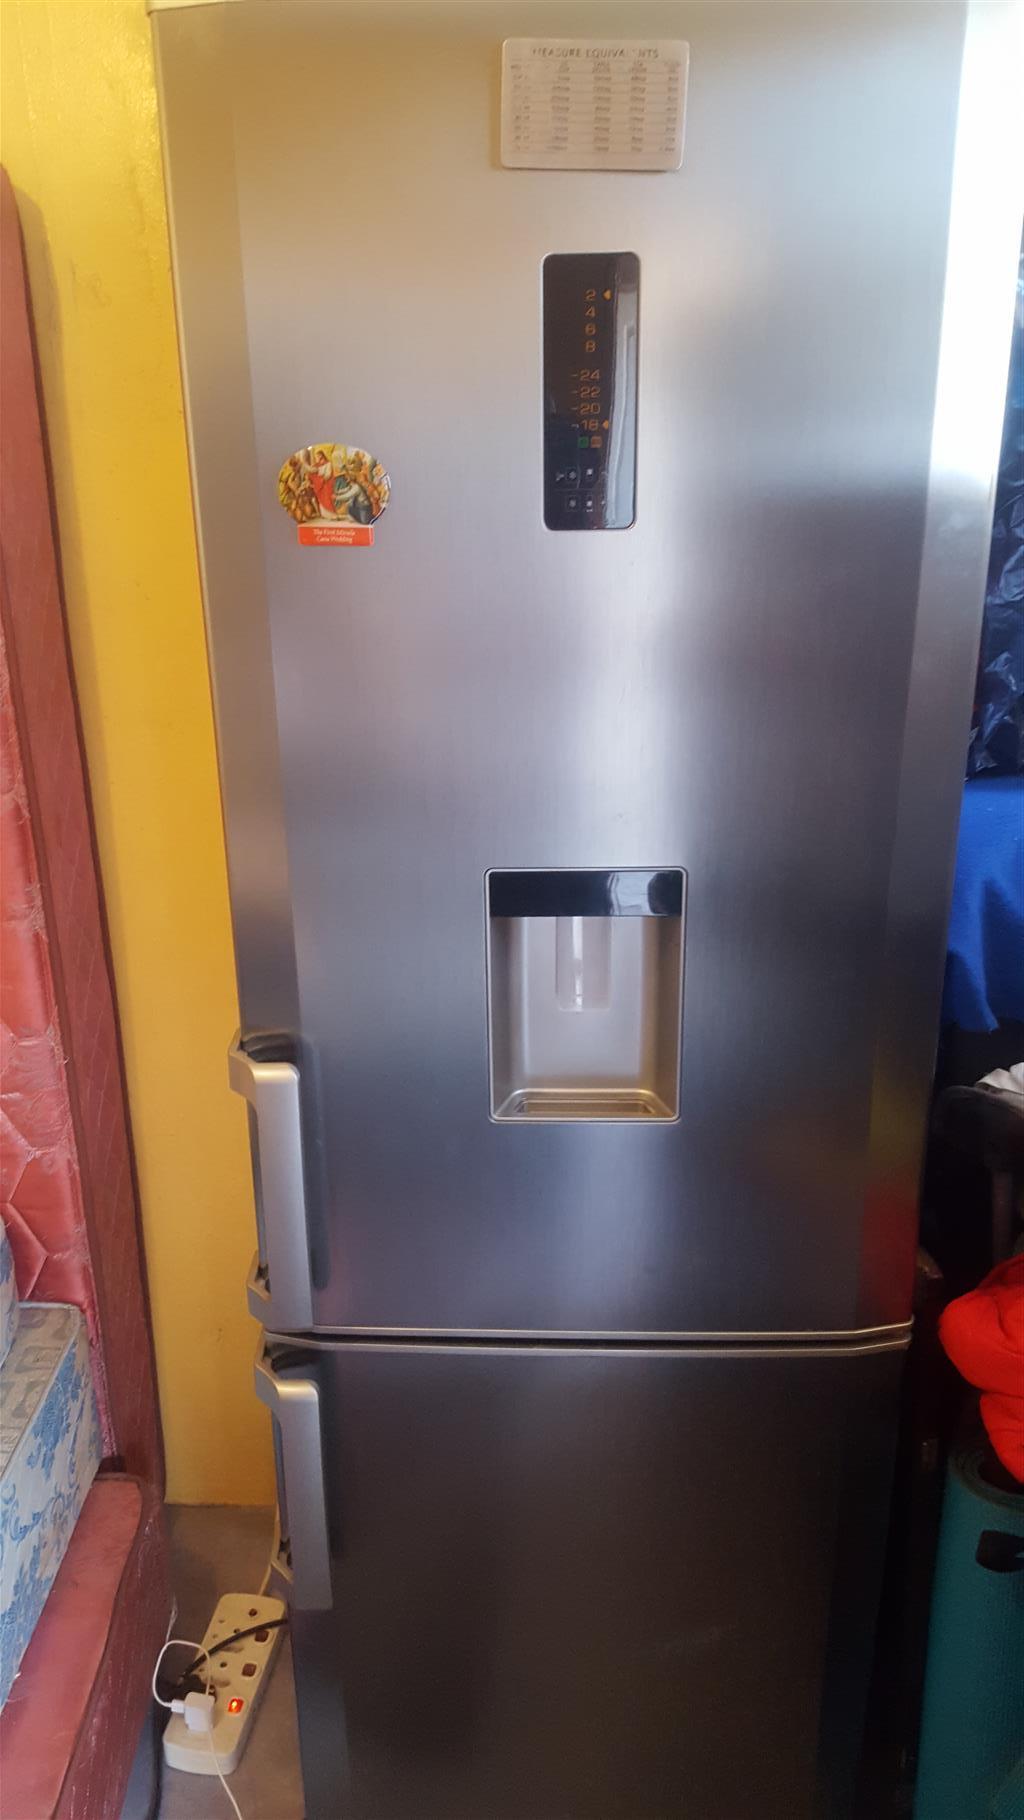 Frost free Defy fridge metallic